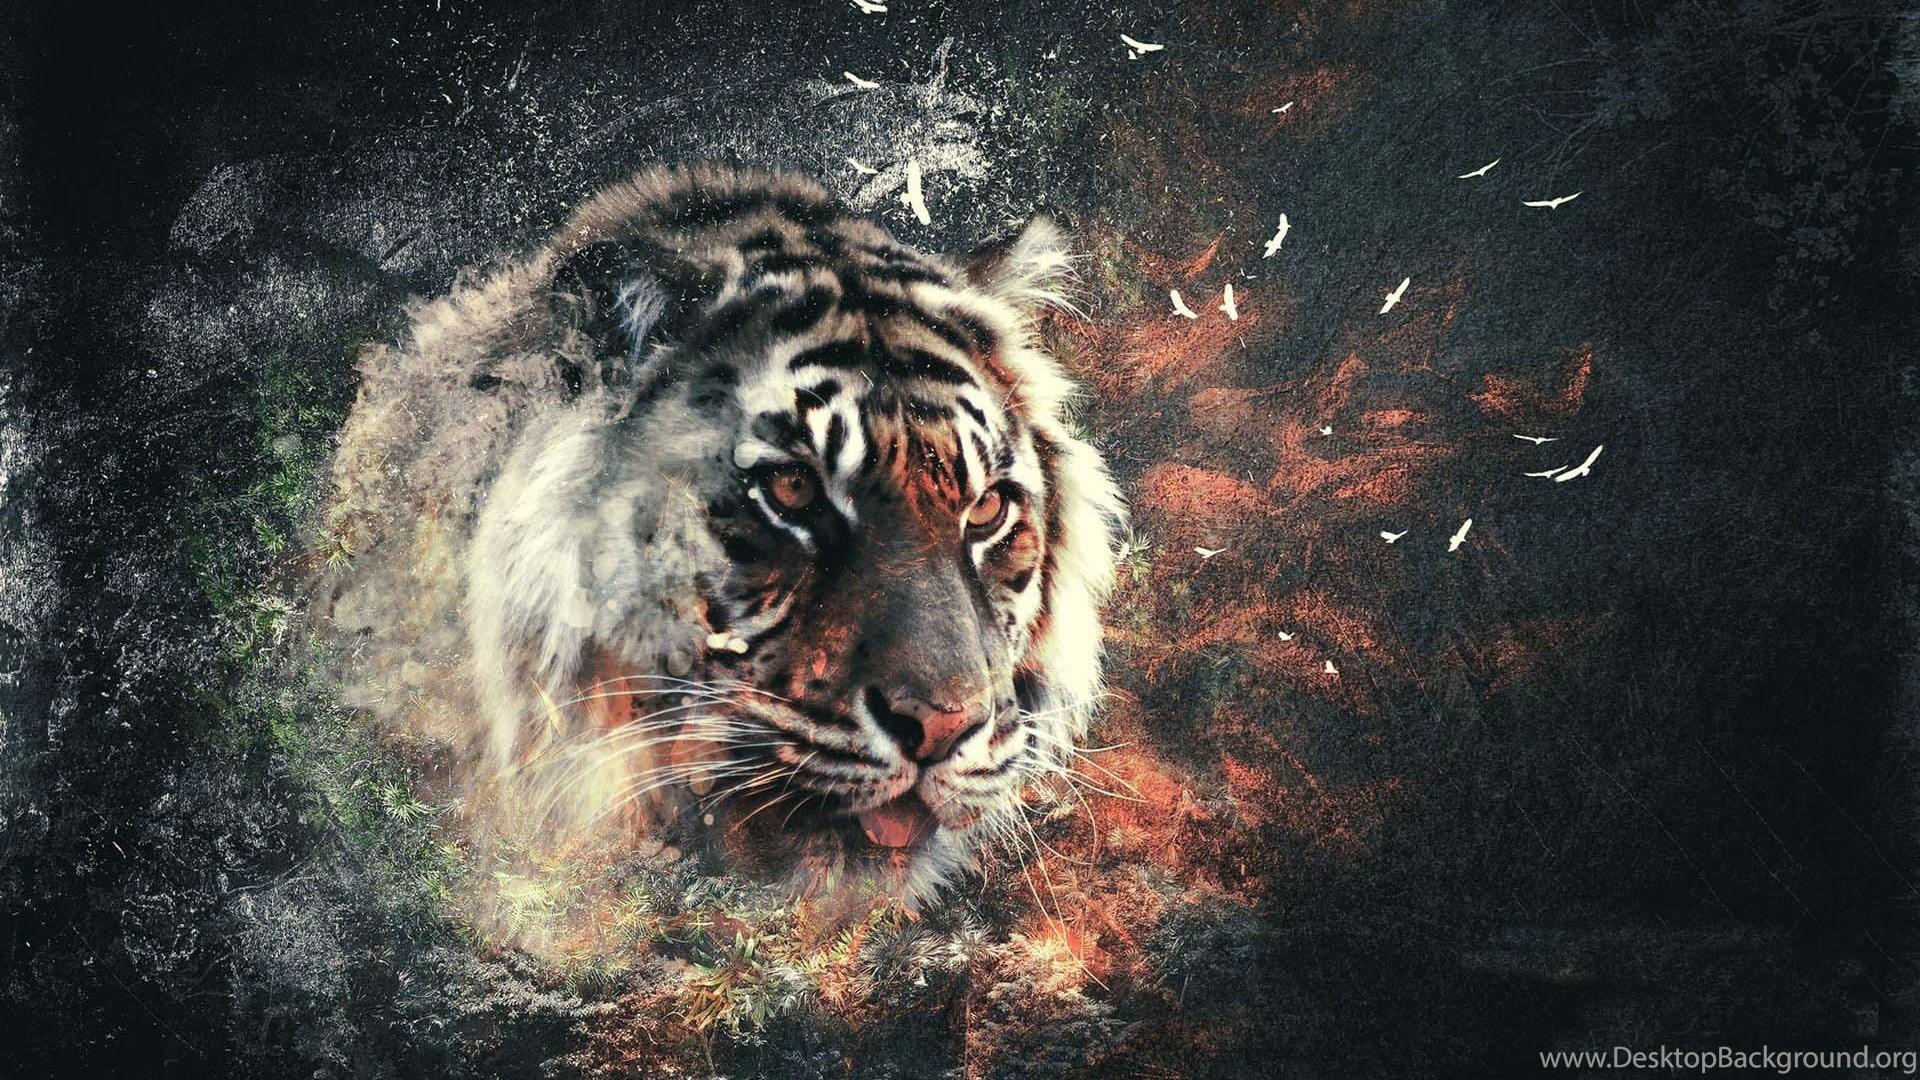 3d Tiger Wallpapers Wallpapers Hd Wide Desktop Background